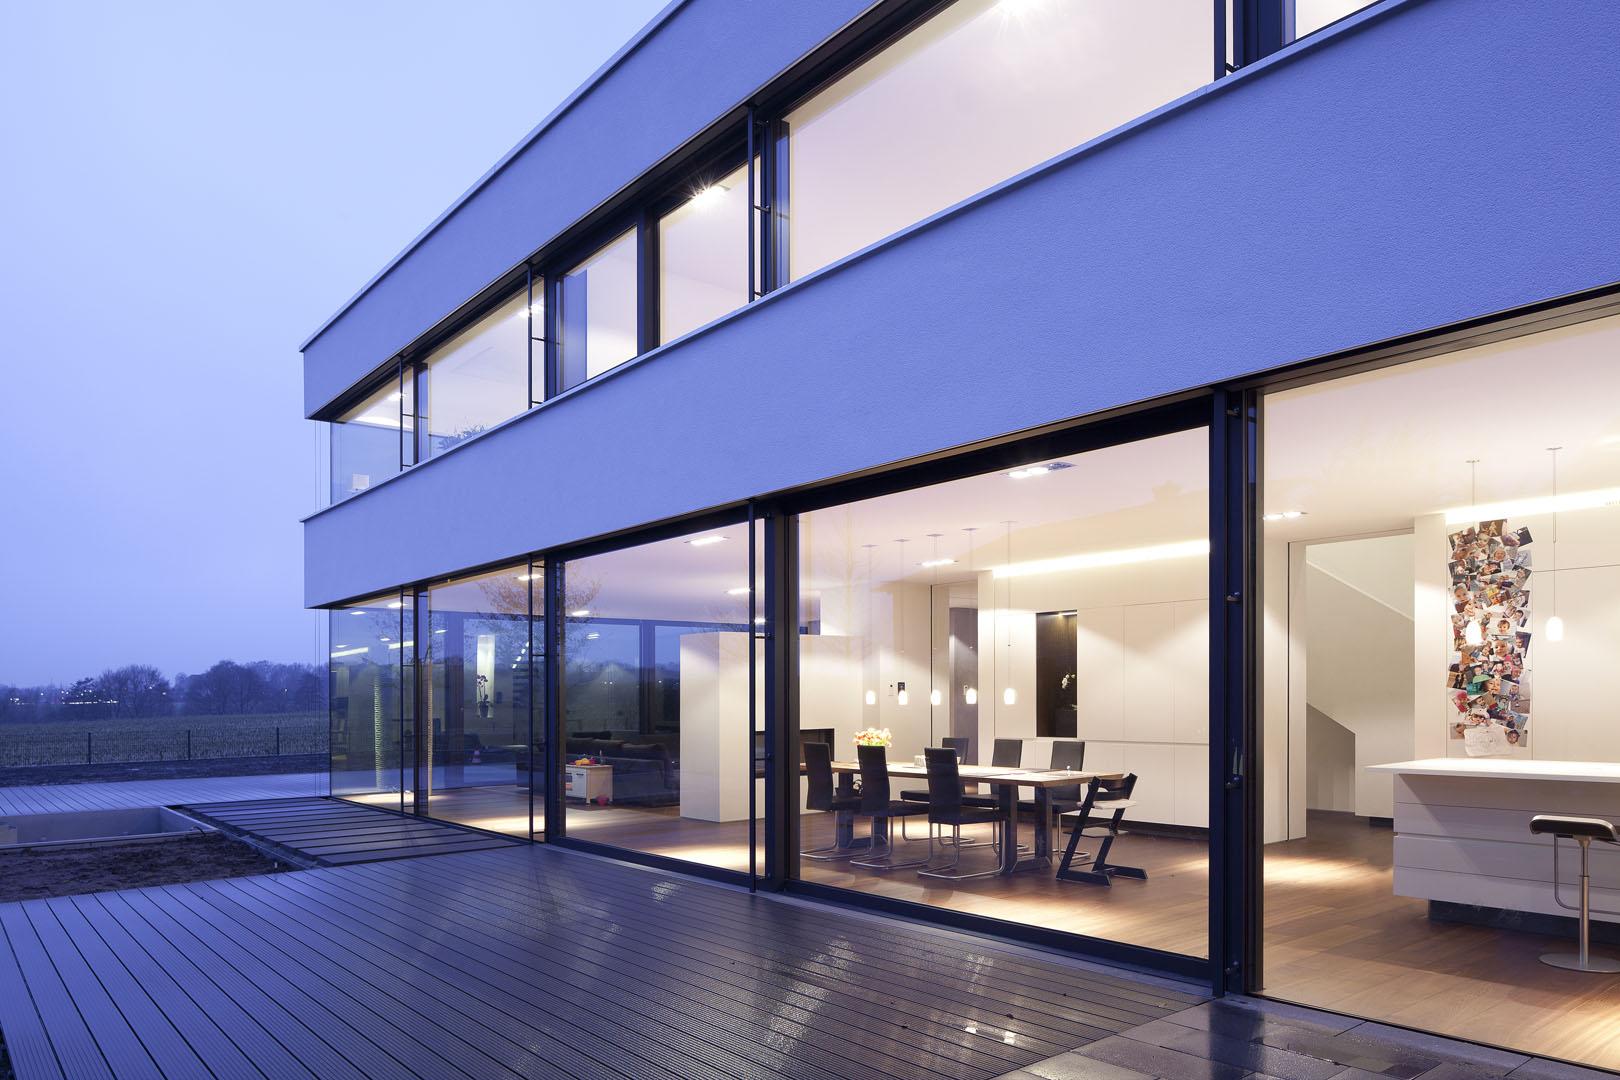 hausb 5 maas partner. Black Bedroom Furniture Sets. Home Design Ideas